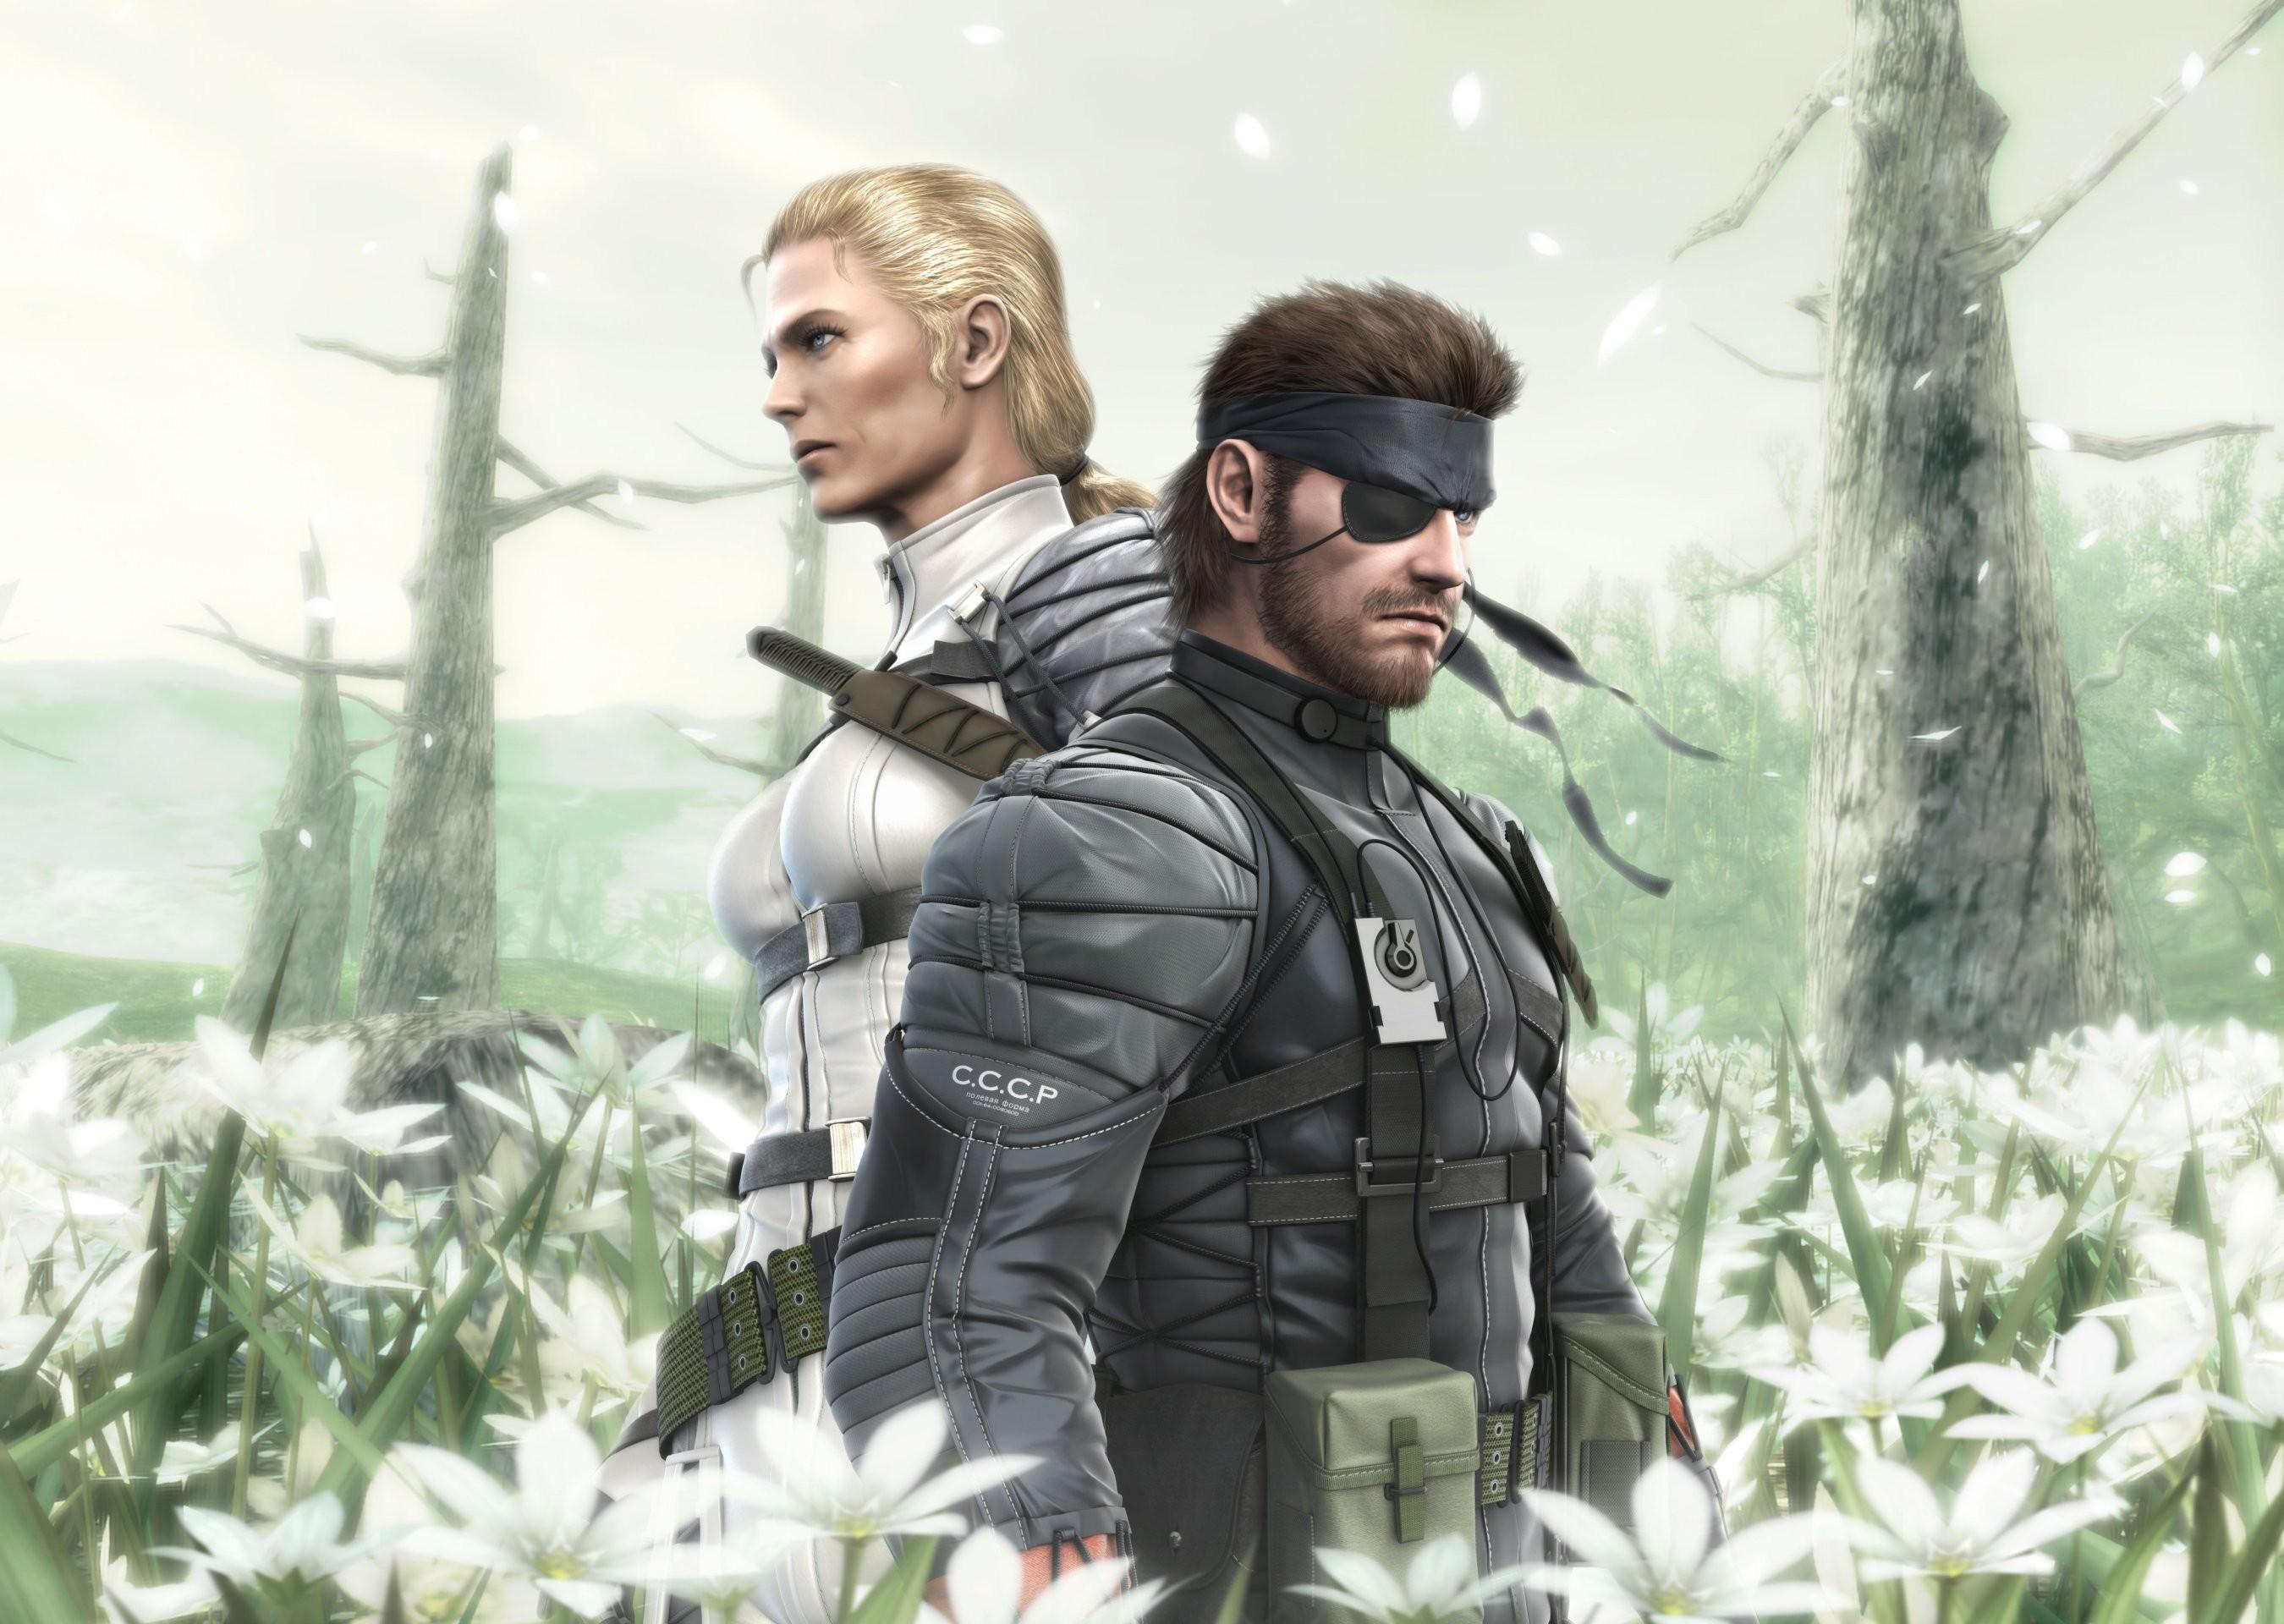 Naked Snake Vs The Boss – Metal Gear Solid 3: Snake Eater #MetalGearSolid3 #